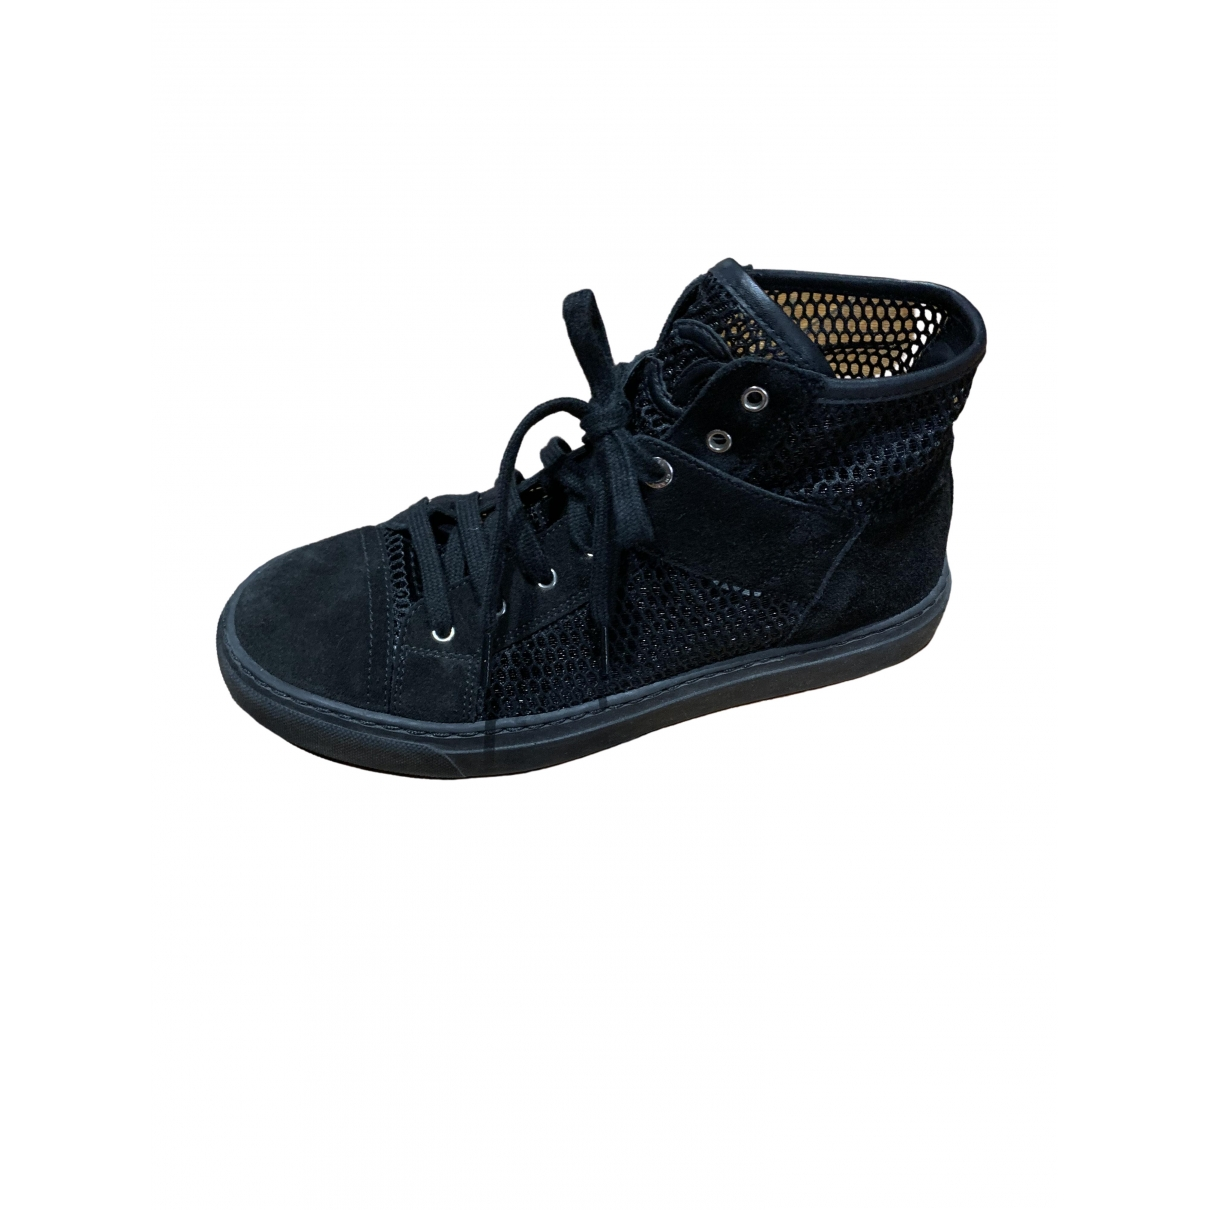 Chanel \N Sneakers in  Schwarz Veloursleder